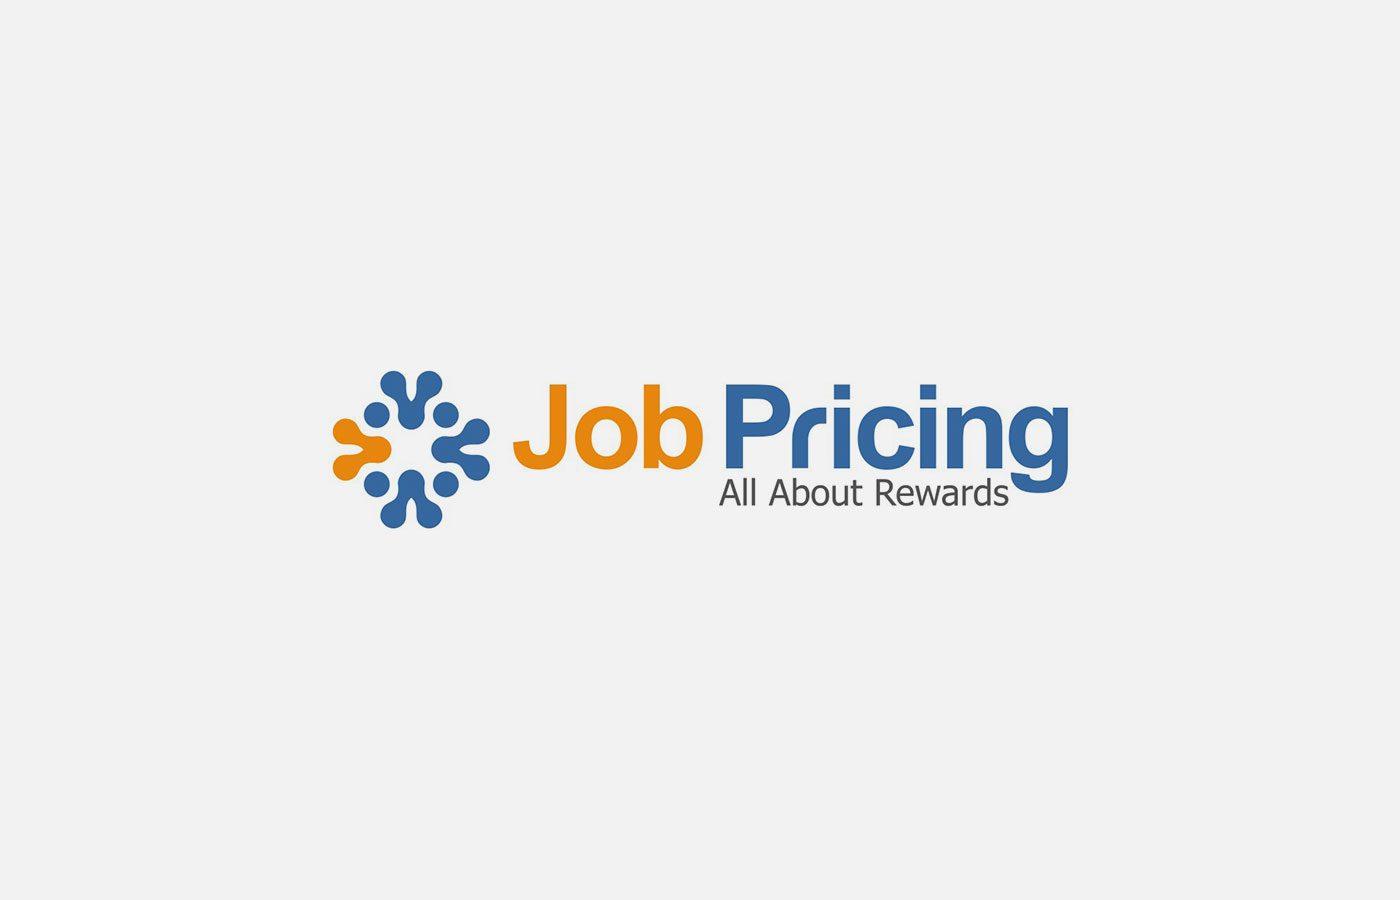 Job Pricing